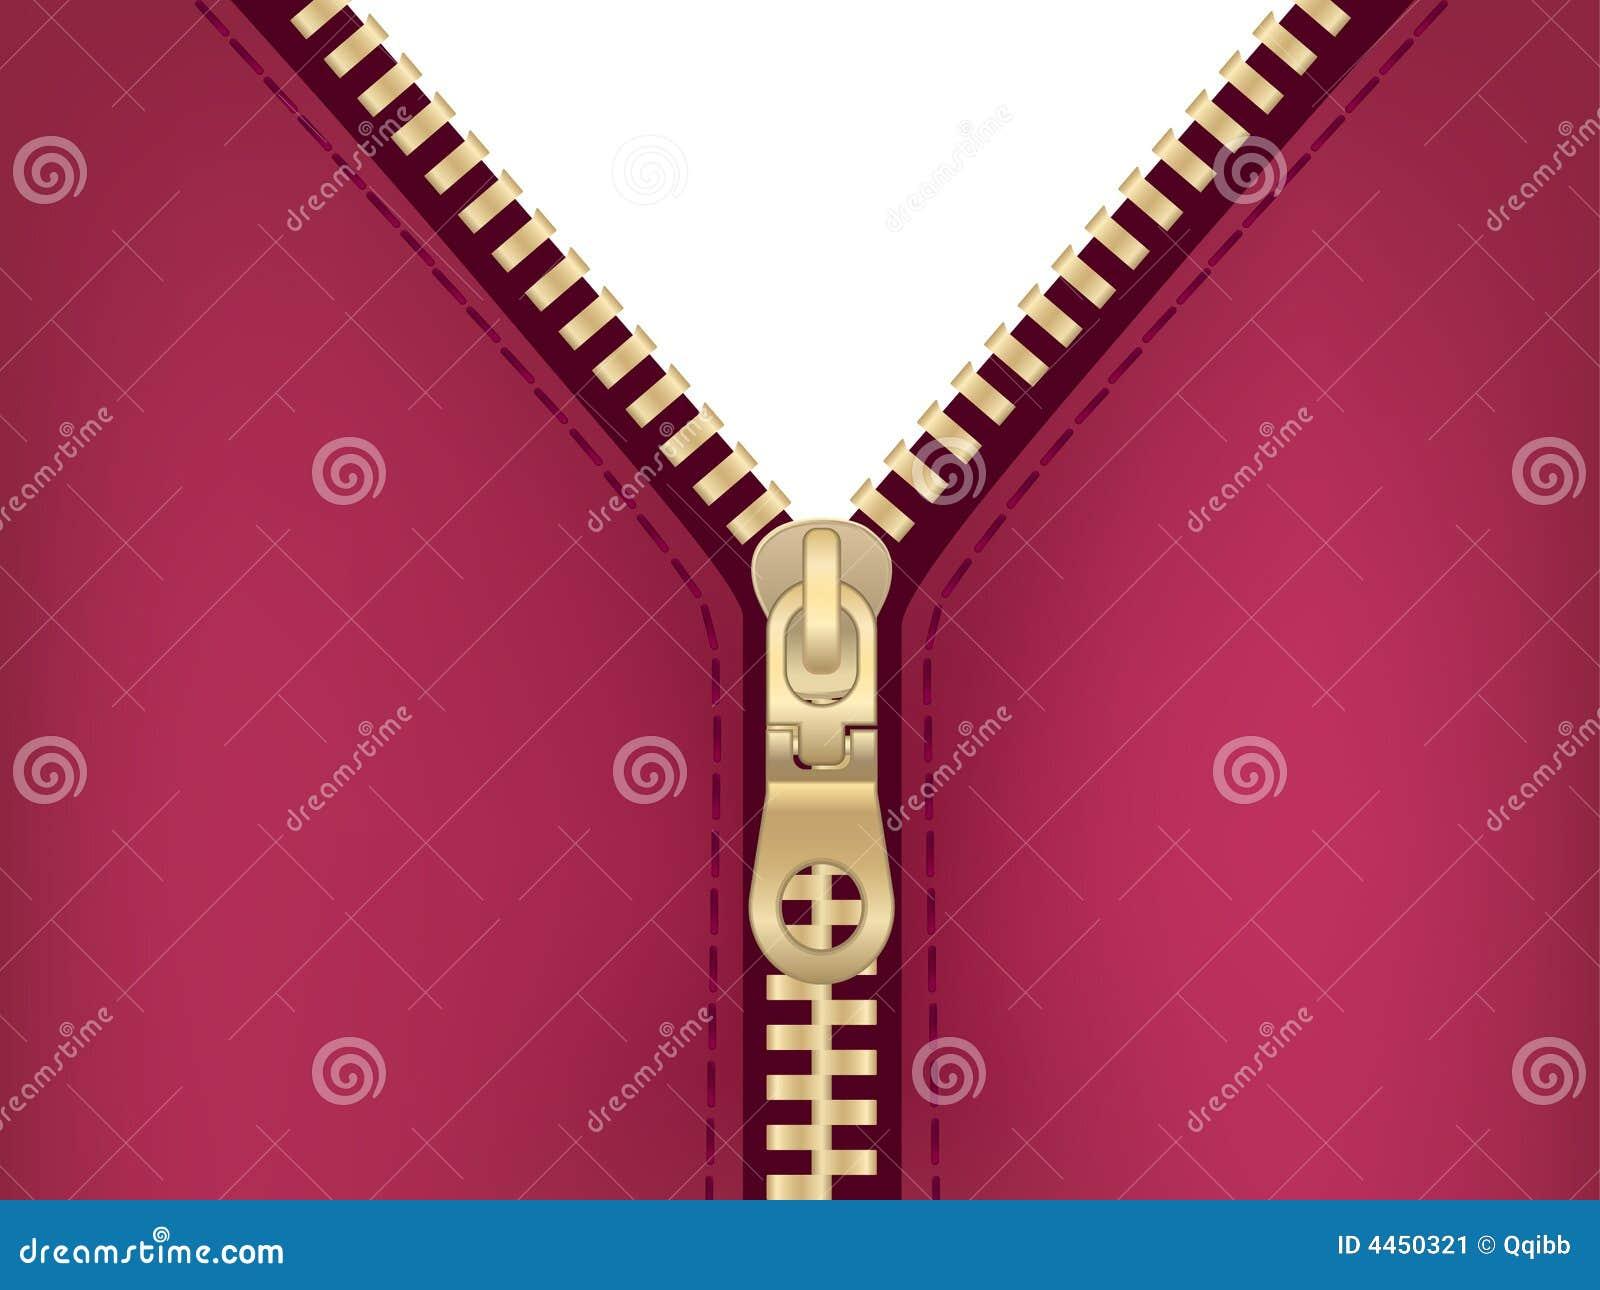 clipart of zipper on jacket stock image image 4450321